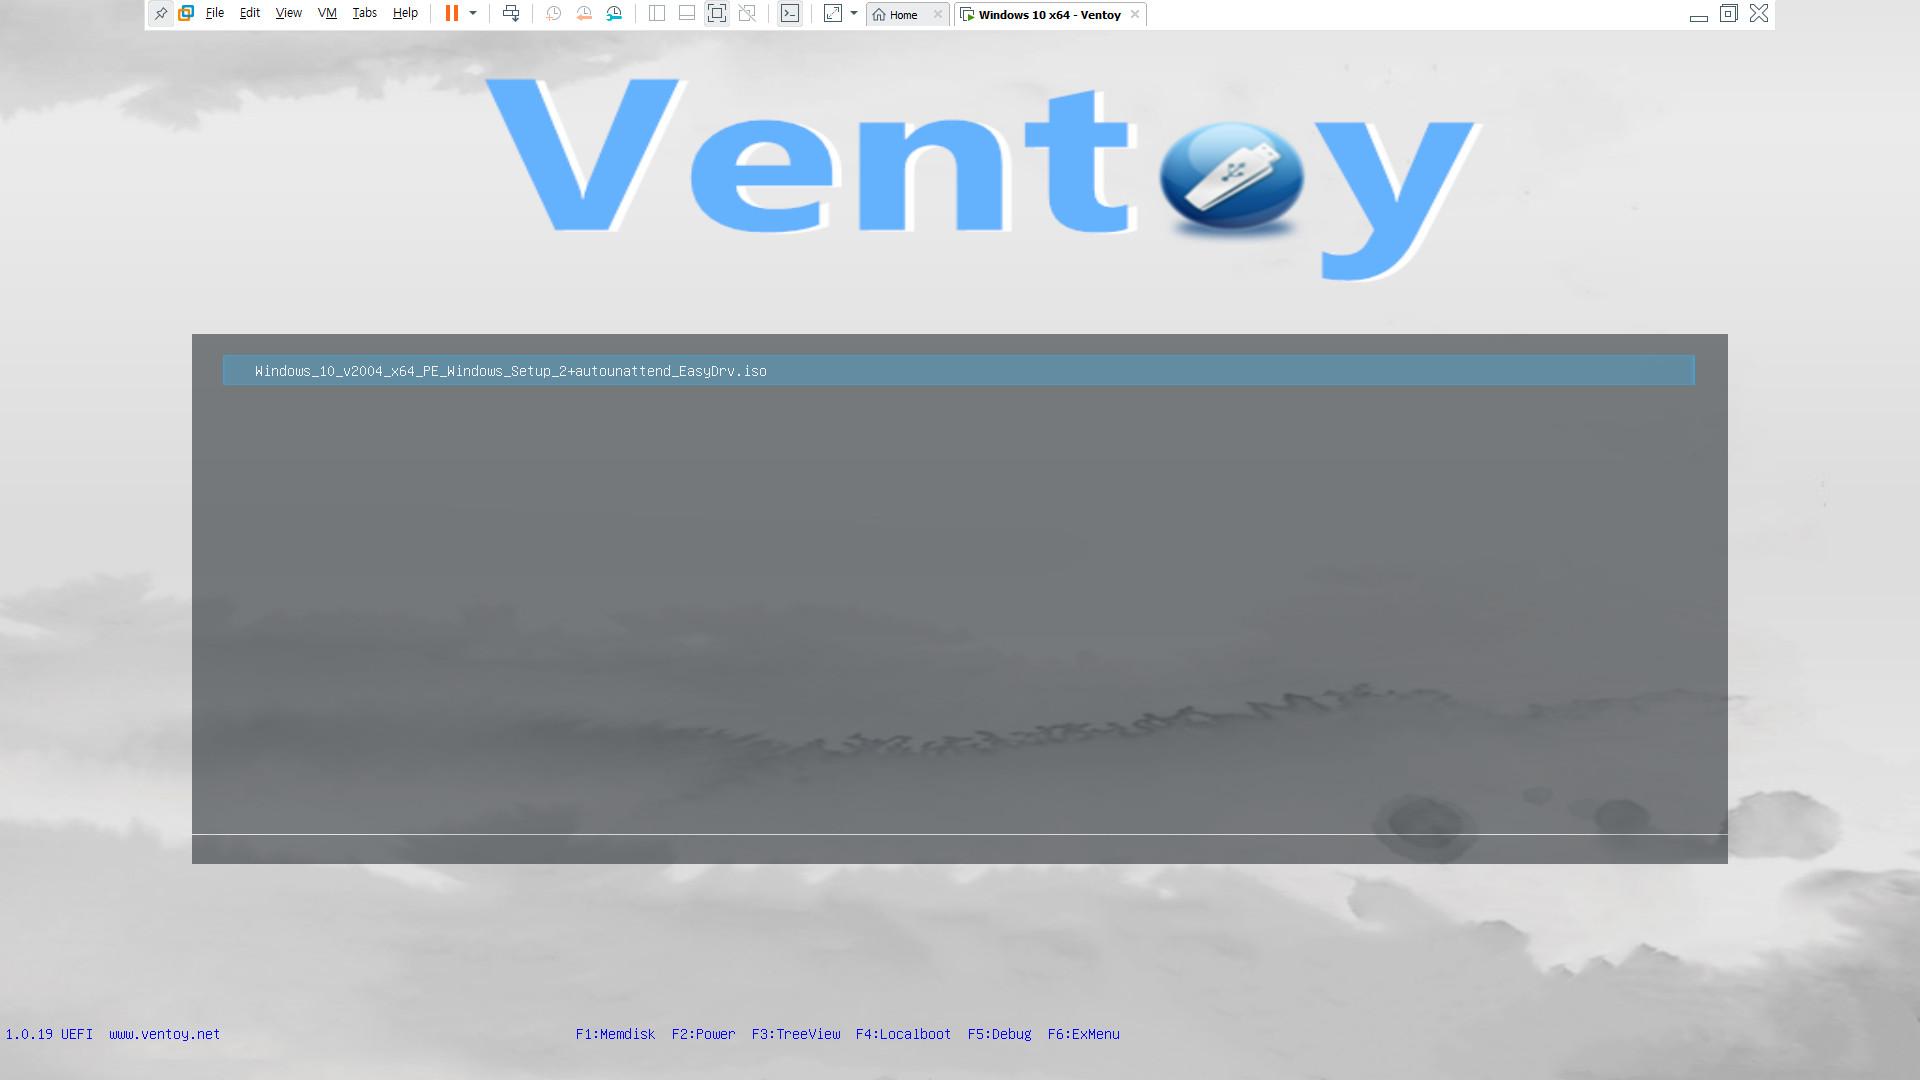 ventoy-1.0.19 으로 usb 멀티 부팅 테스트 - v2004 뼈대 2탄 테스트 - ISO로 테스트 2020-08-25_161713.jpg